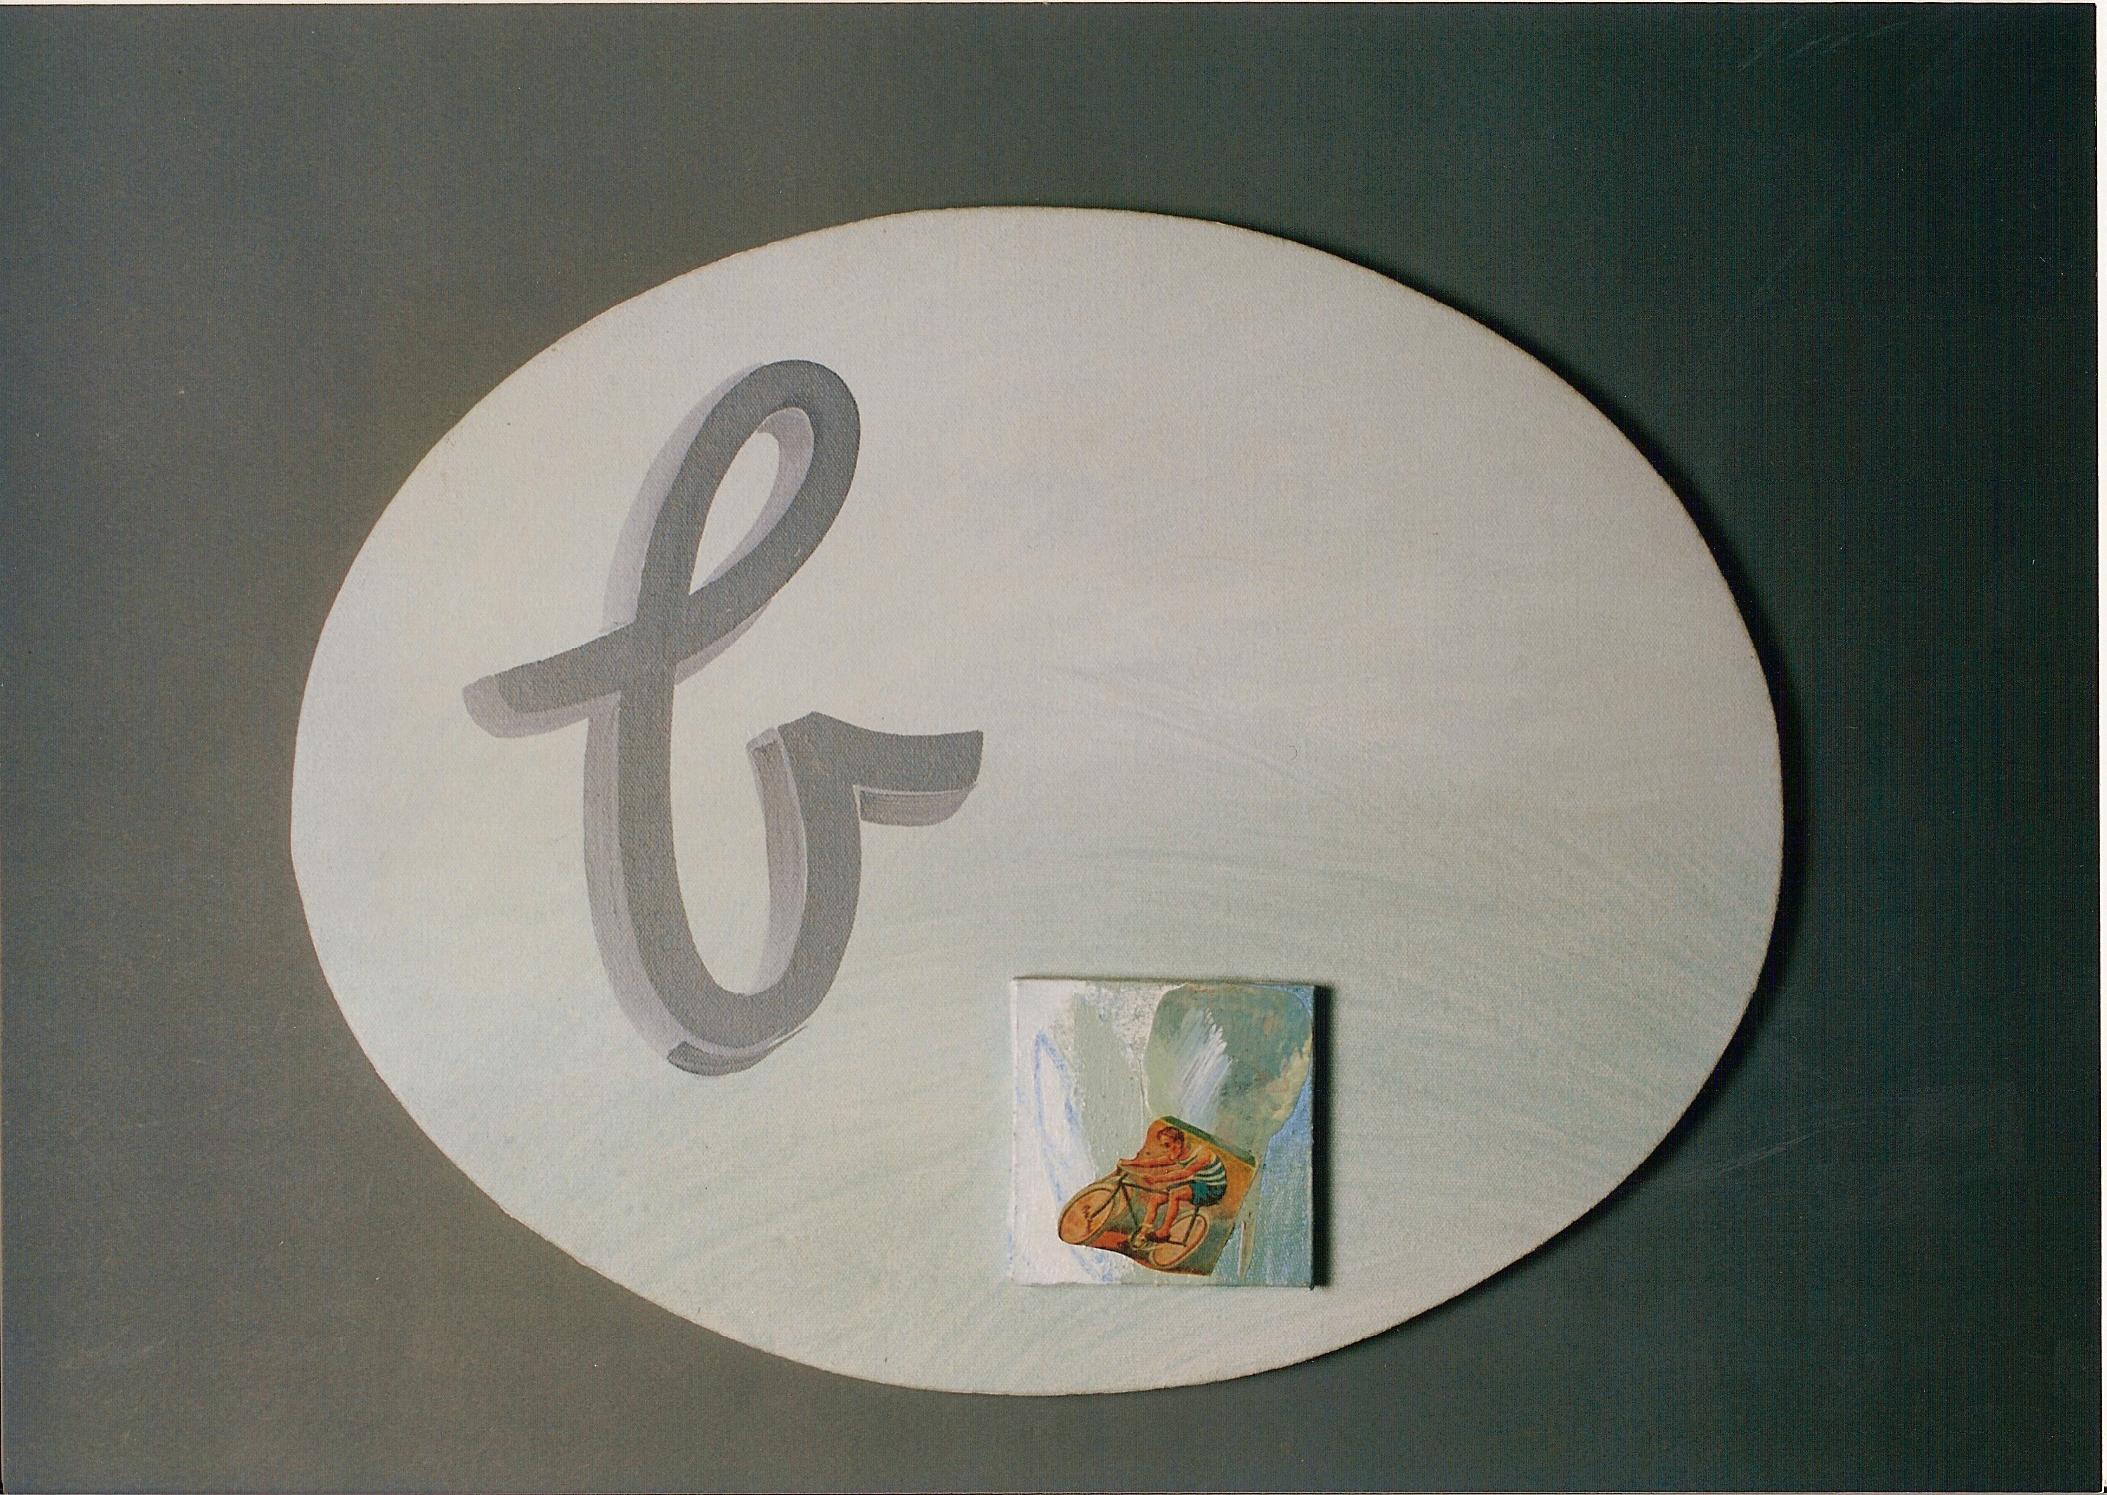 Abecedario B Bicicleta; objetos ensamblados, tela, papel sobre bastidor, 30 cm x 40 cm, 2007